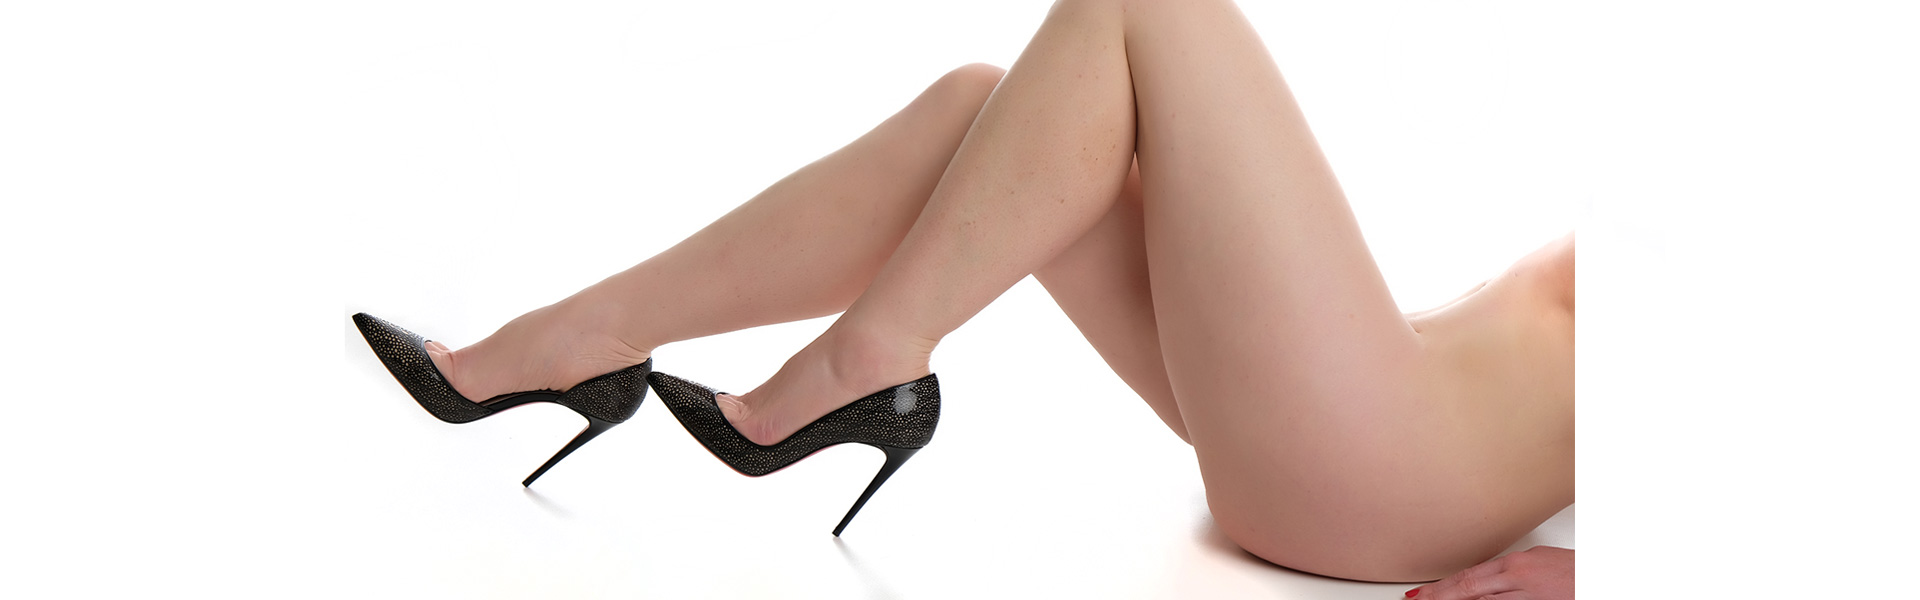 foot-fetish-surrey